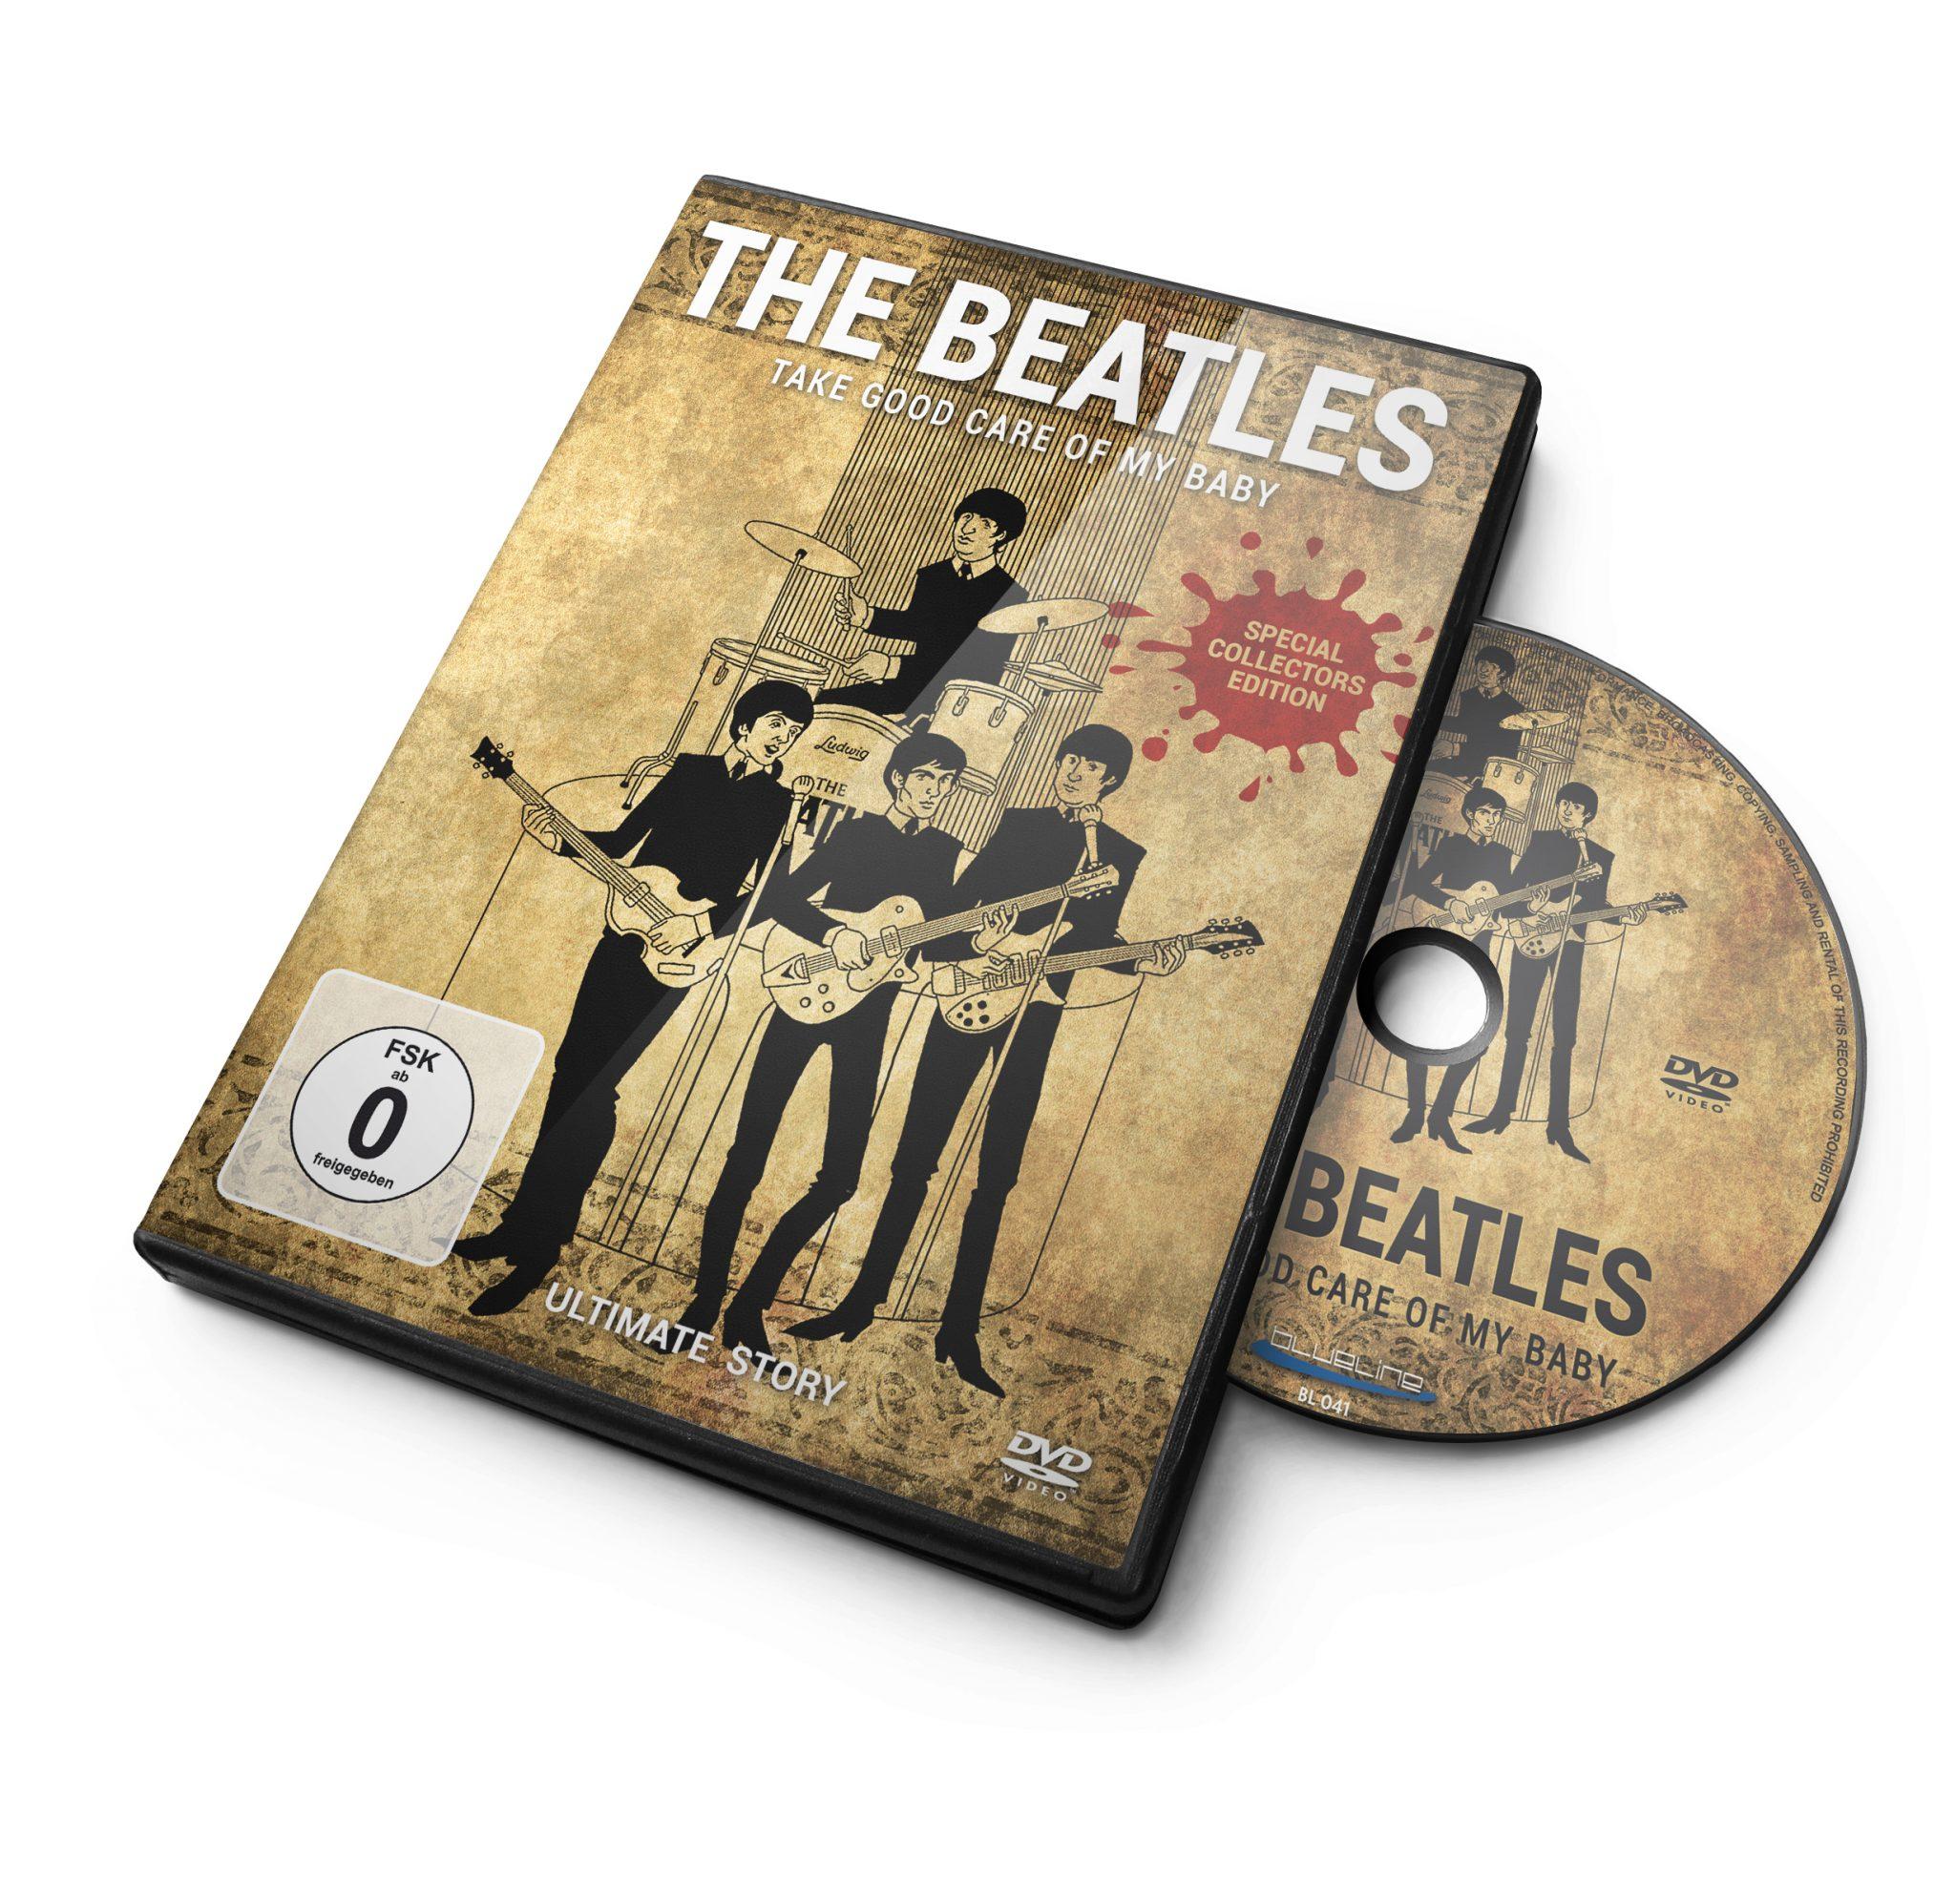 beatles_dvd